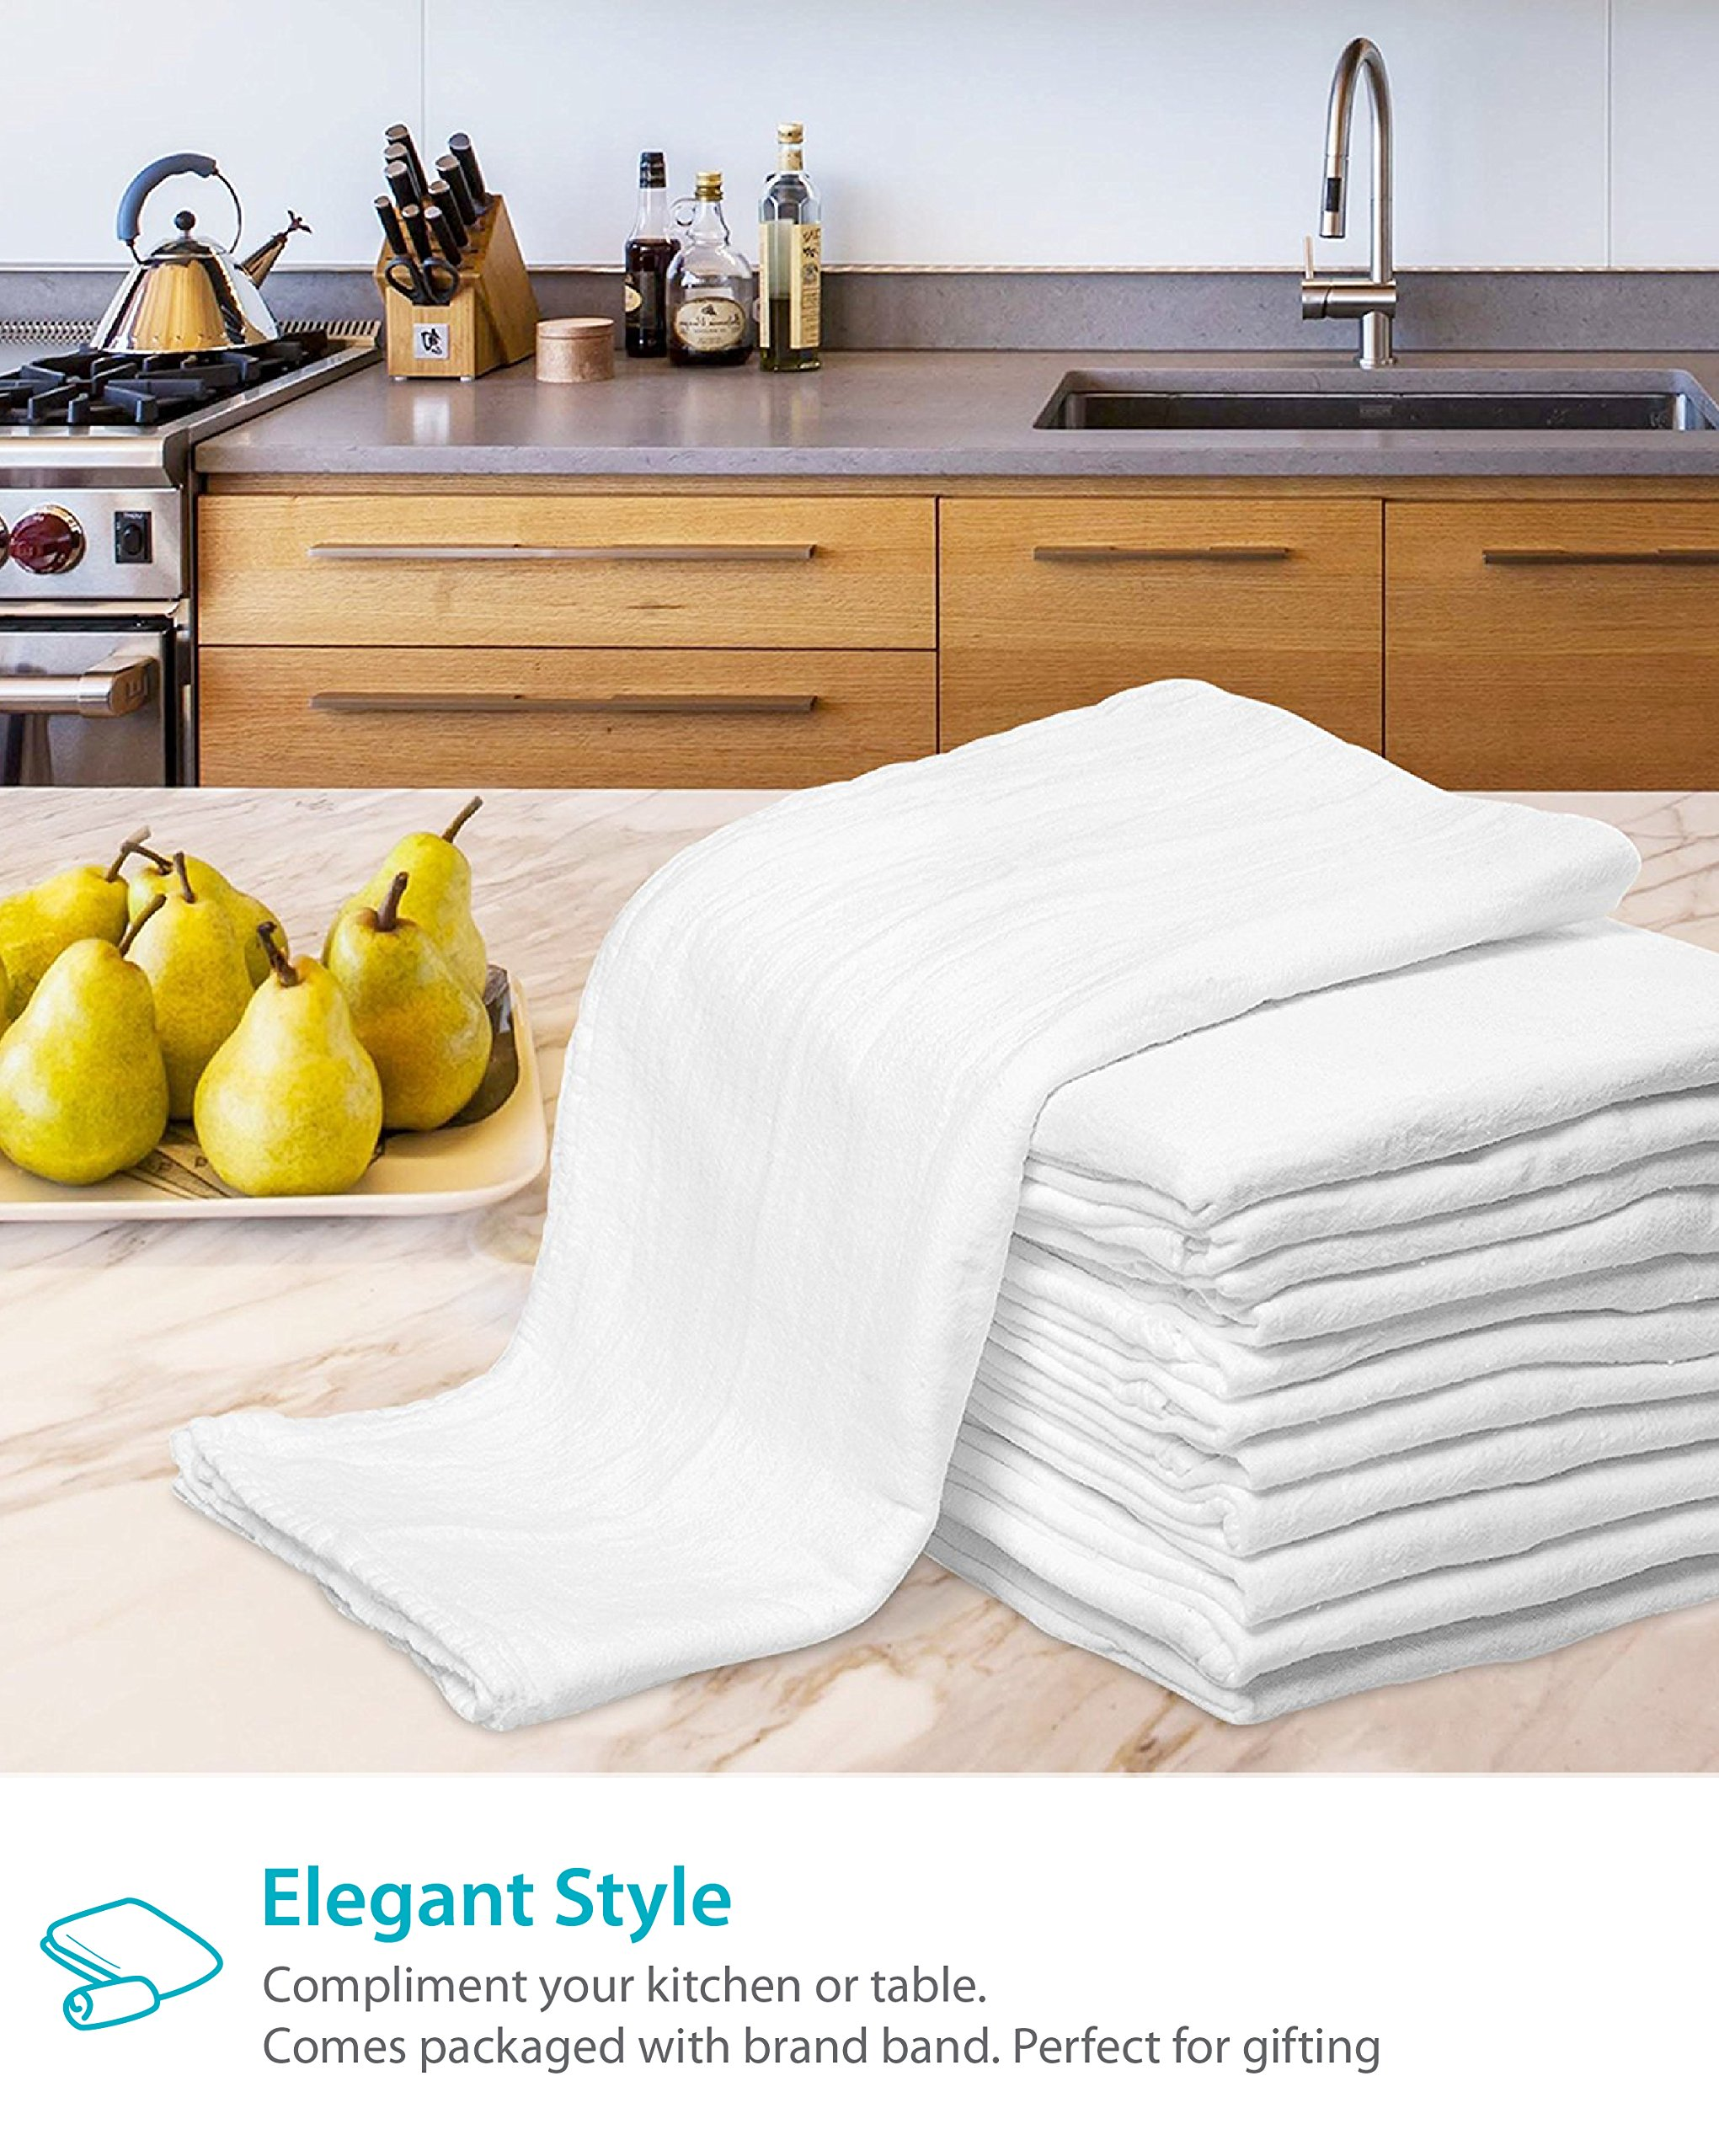 Zeppoli 12-Pack Flour Sack Towels - 31'' x 31'' Kitchen Towels - Absorbent White Dish Towels - 100% Ring Spun Cotton Bar Towels by Zeppoli (Image #8)